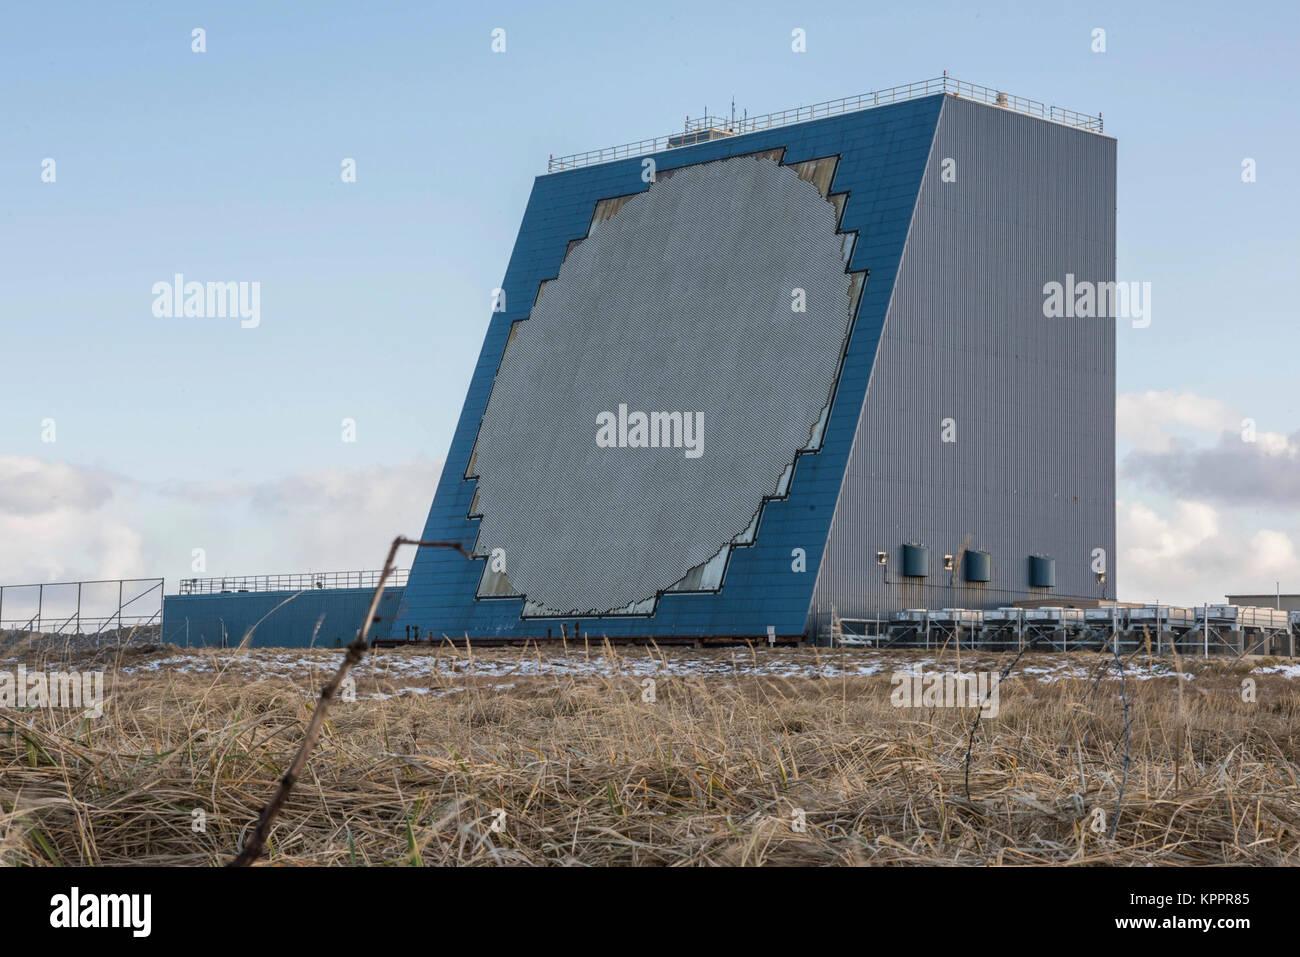 single radar